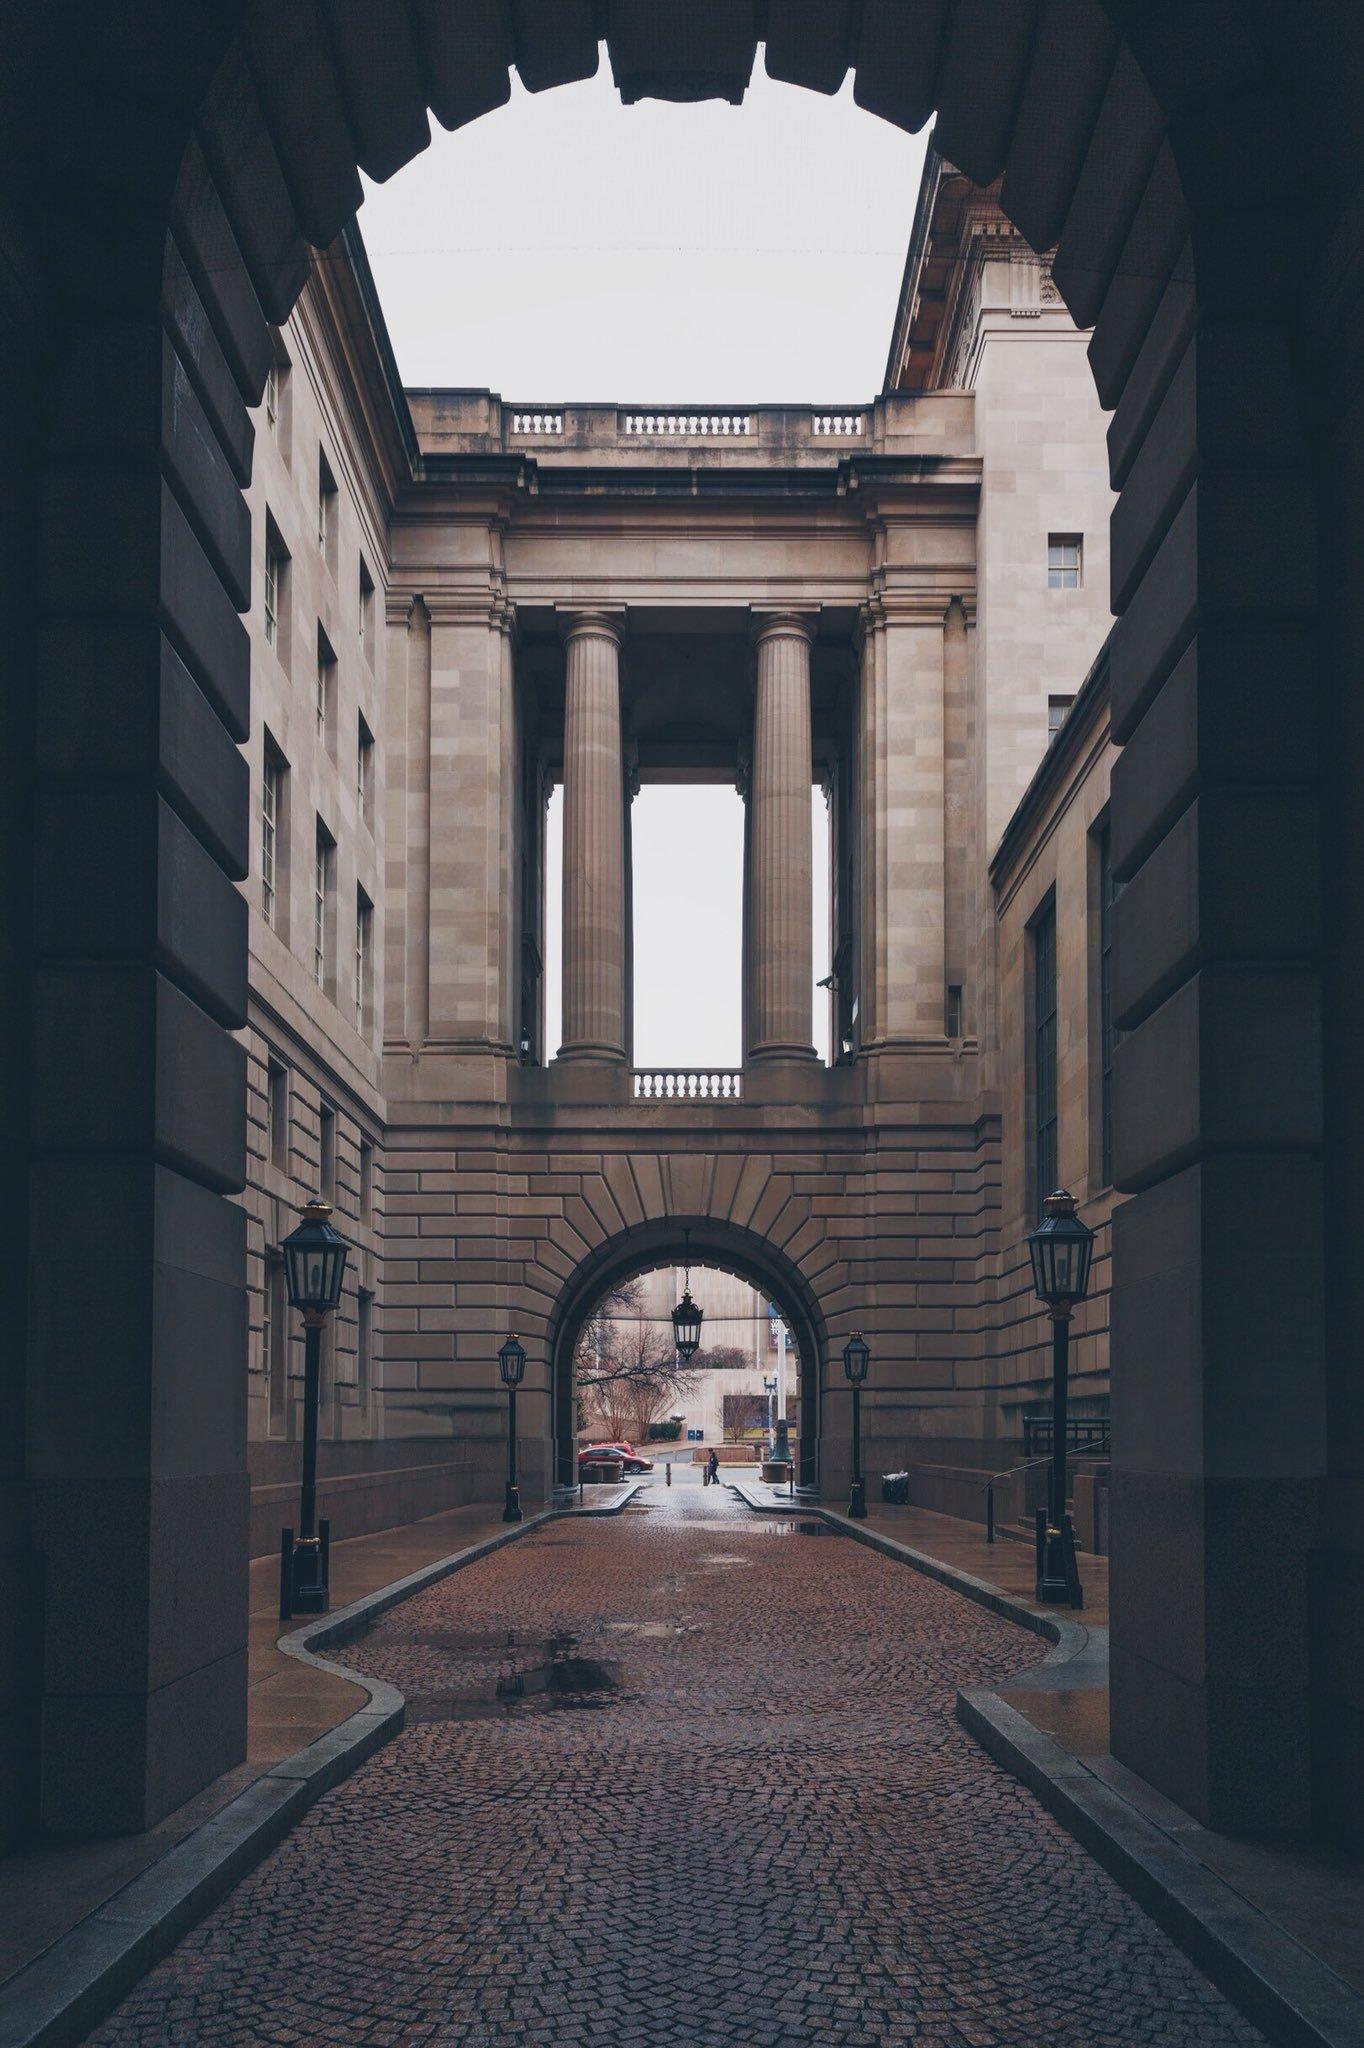 street_photography_14.jpg